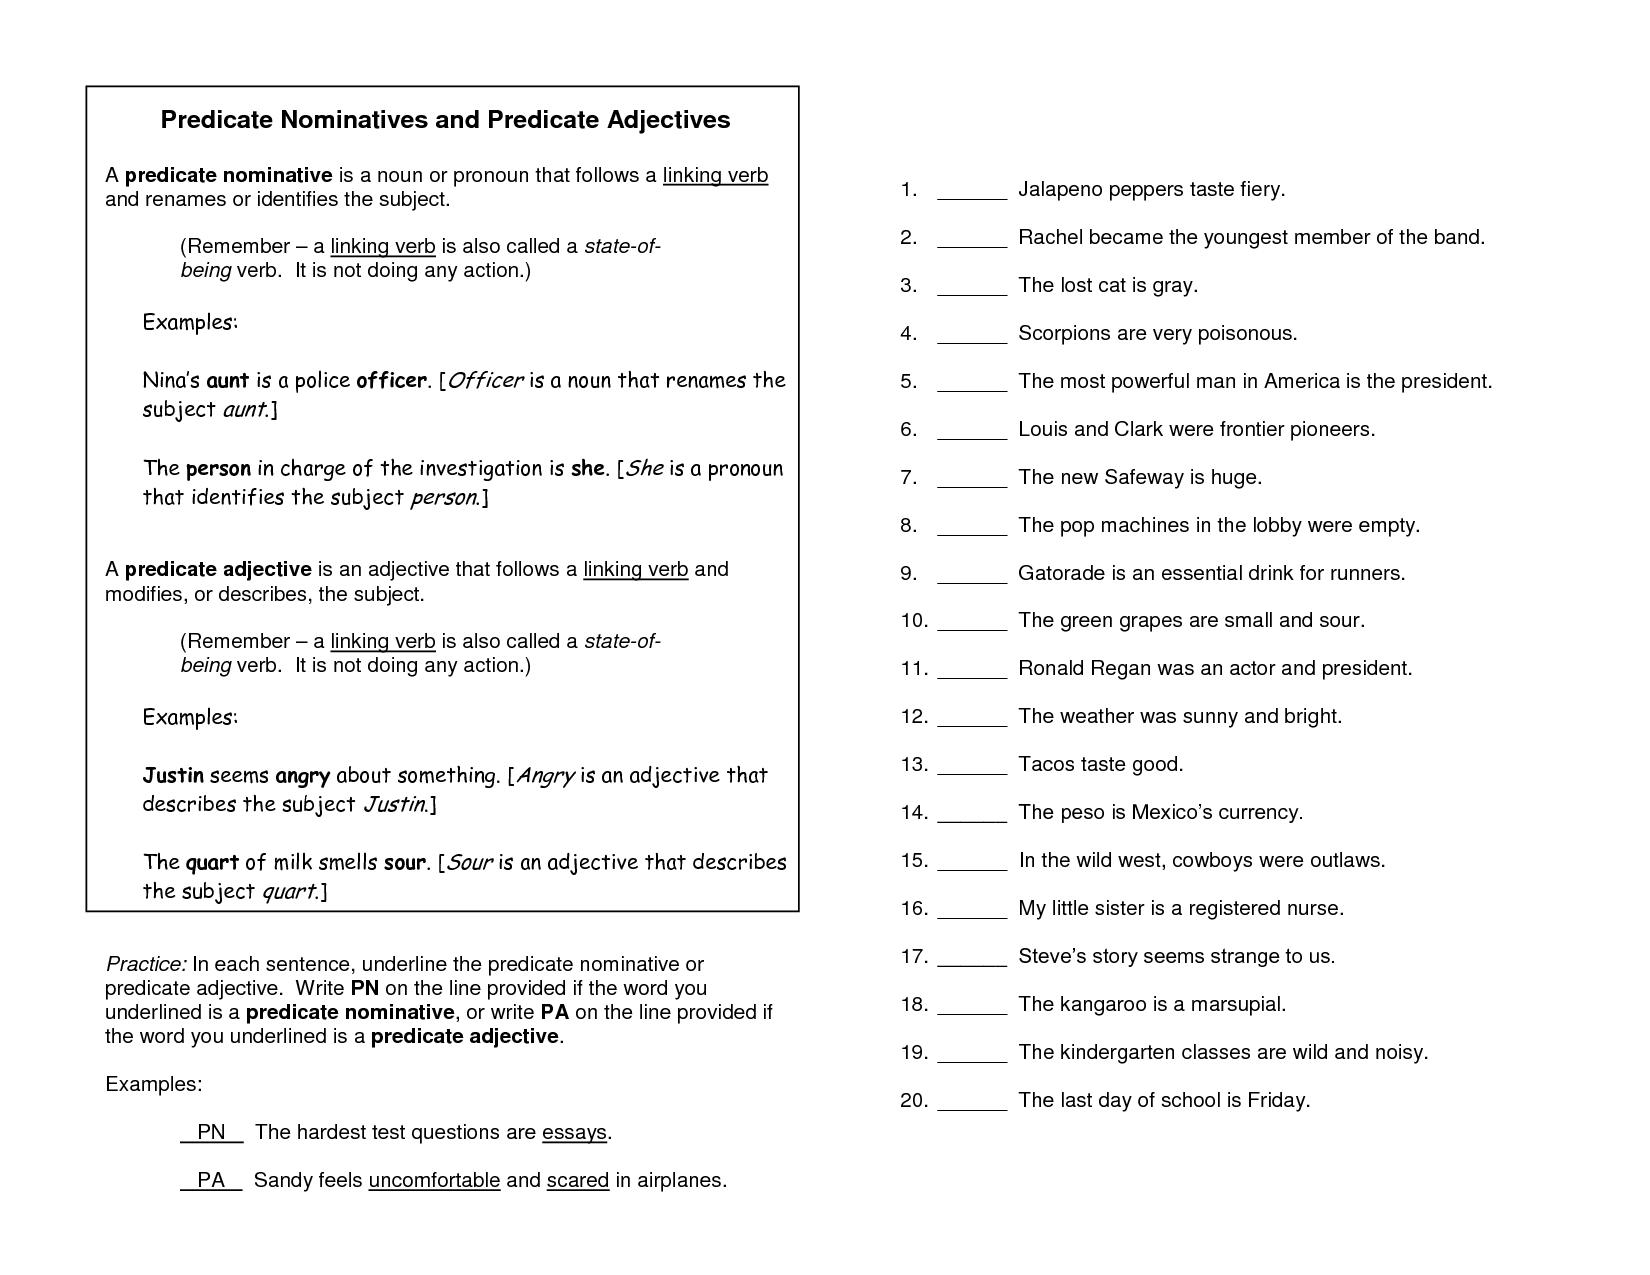 Predicate Adjective Worksheet